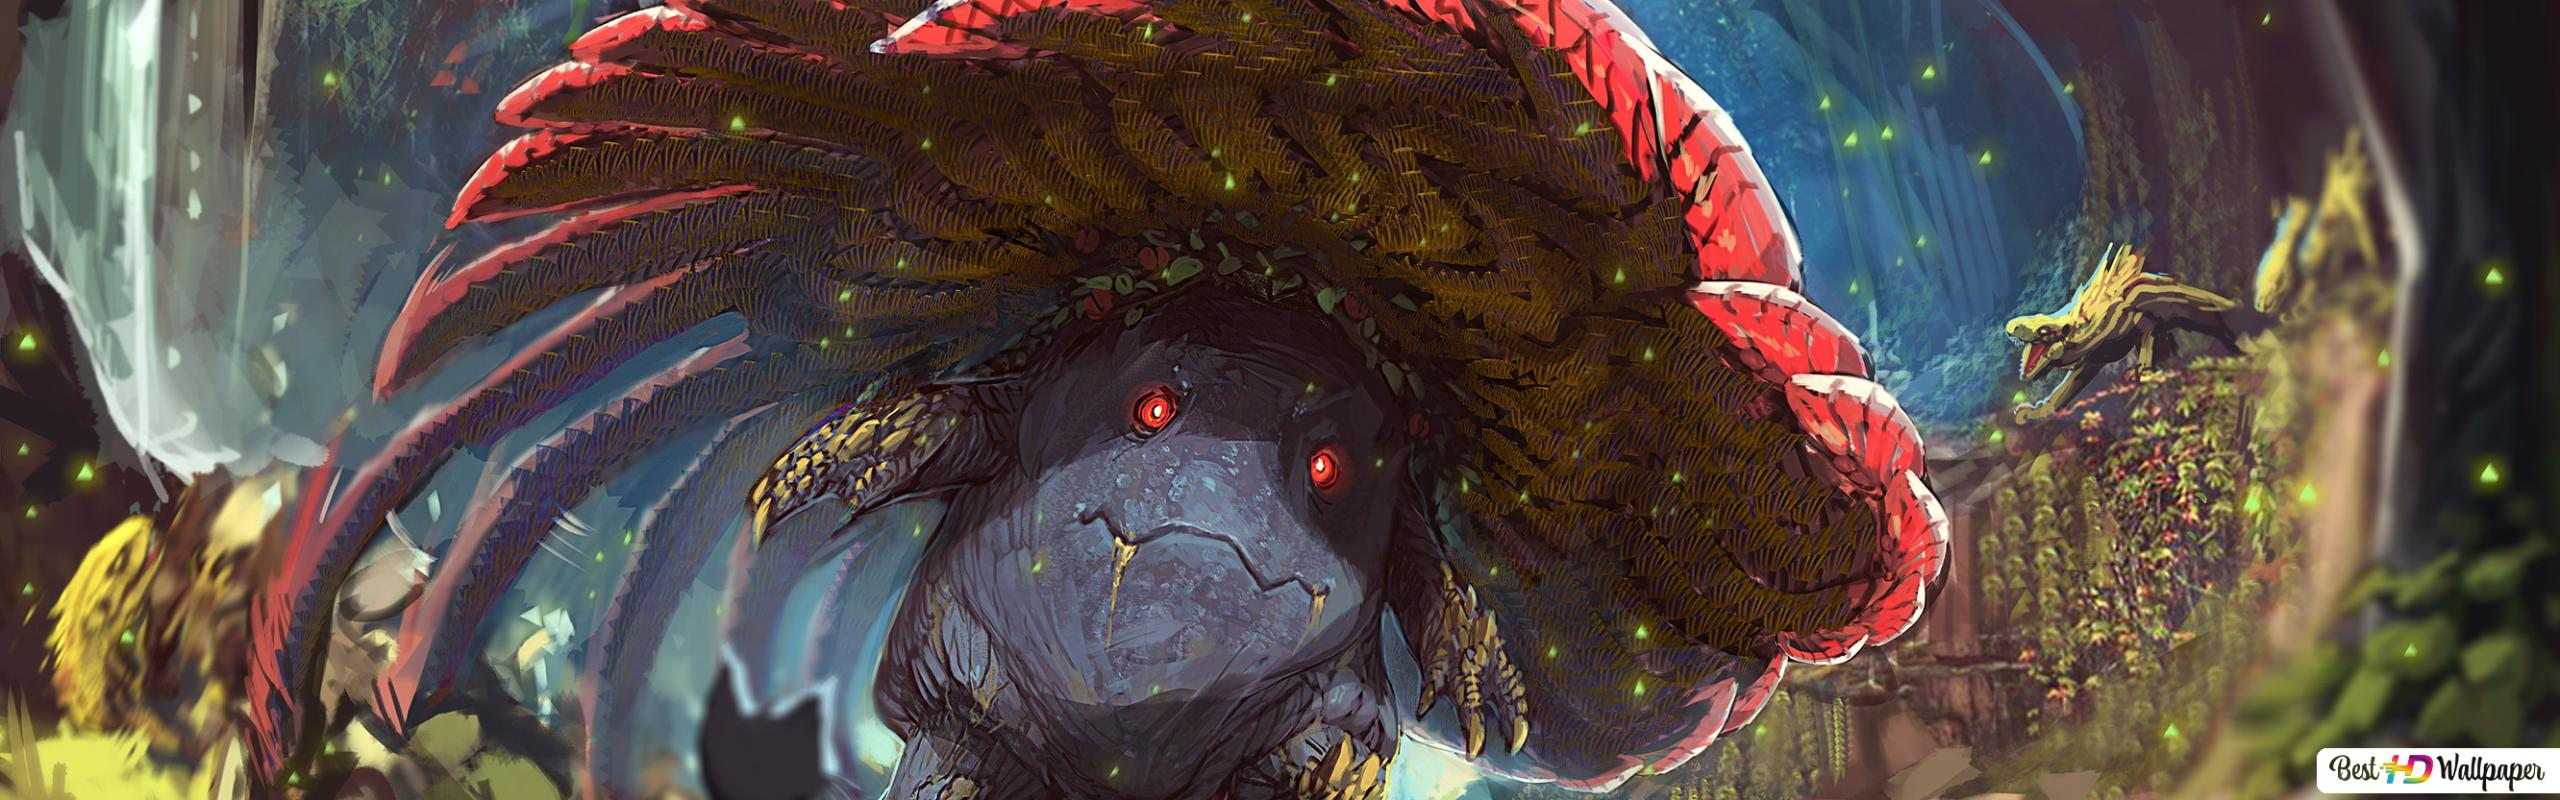 Monster Hunter World X Vileplume Hd Wallpaper Download